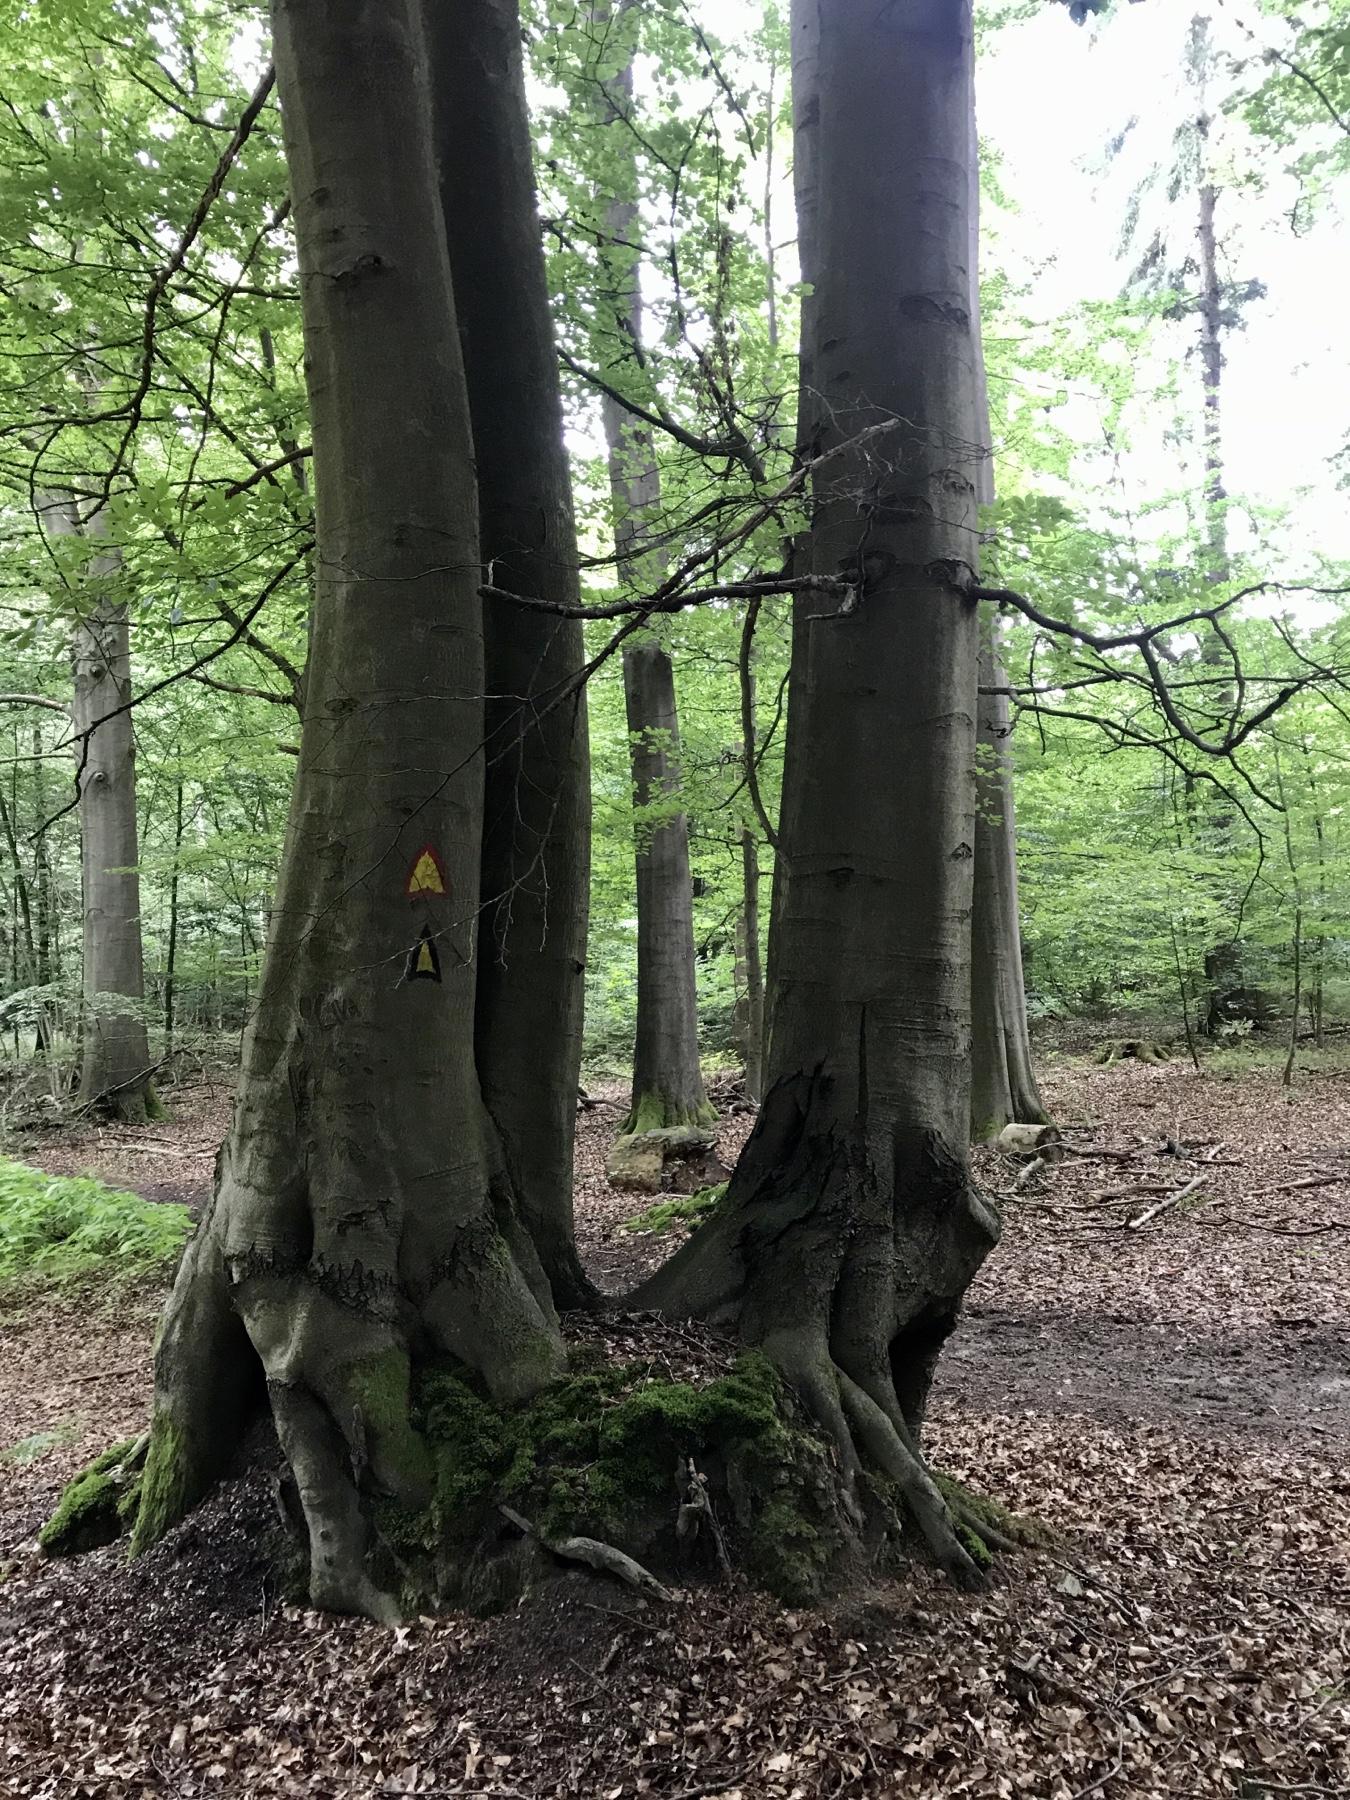 Baum im Naturschutzgebiet vor Lütjensee, Stormarnweg, Etappe 2